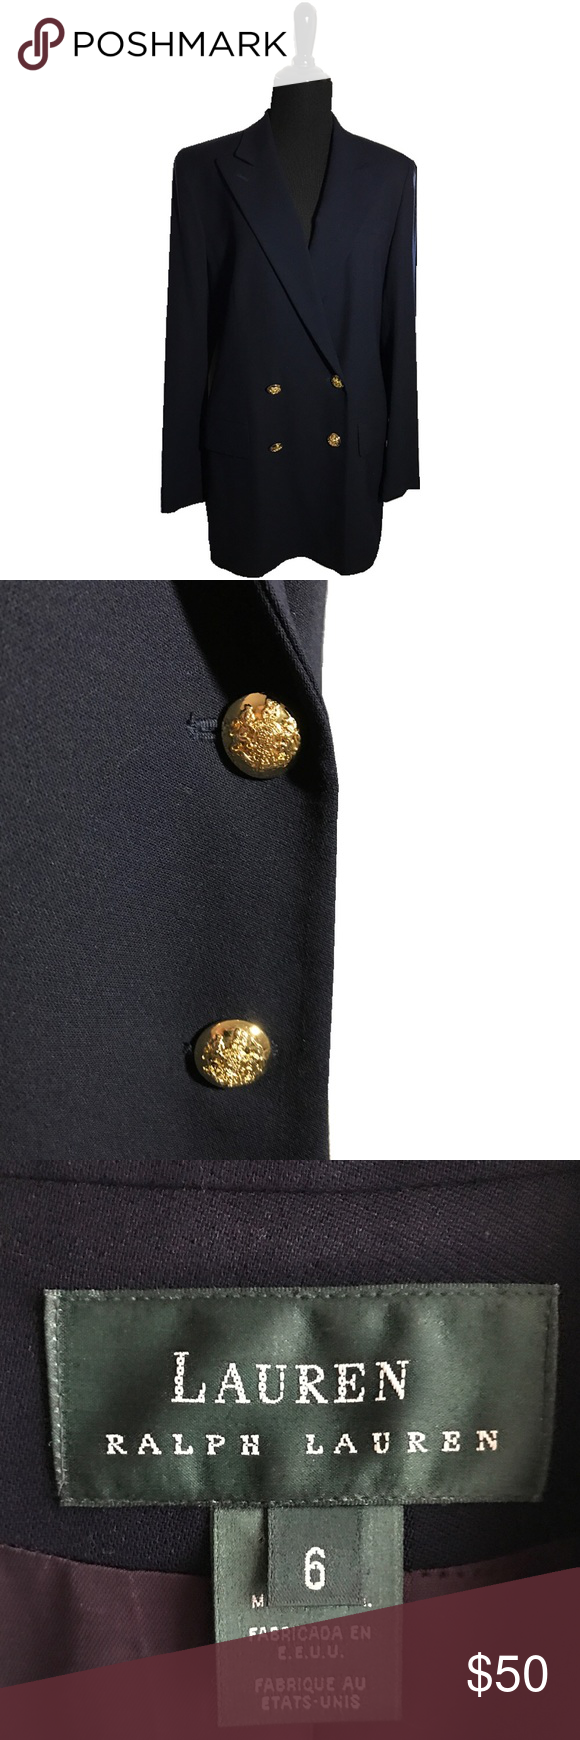 Ralph Lauren Preppy Navy Blazer Navy with gold buttons. Classic silhouette. Made in the USA Ralph Lauren Jackets & Coats Blazers